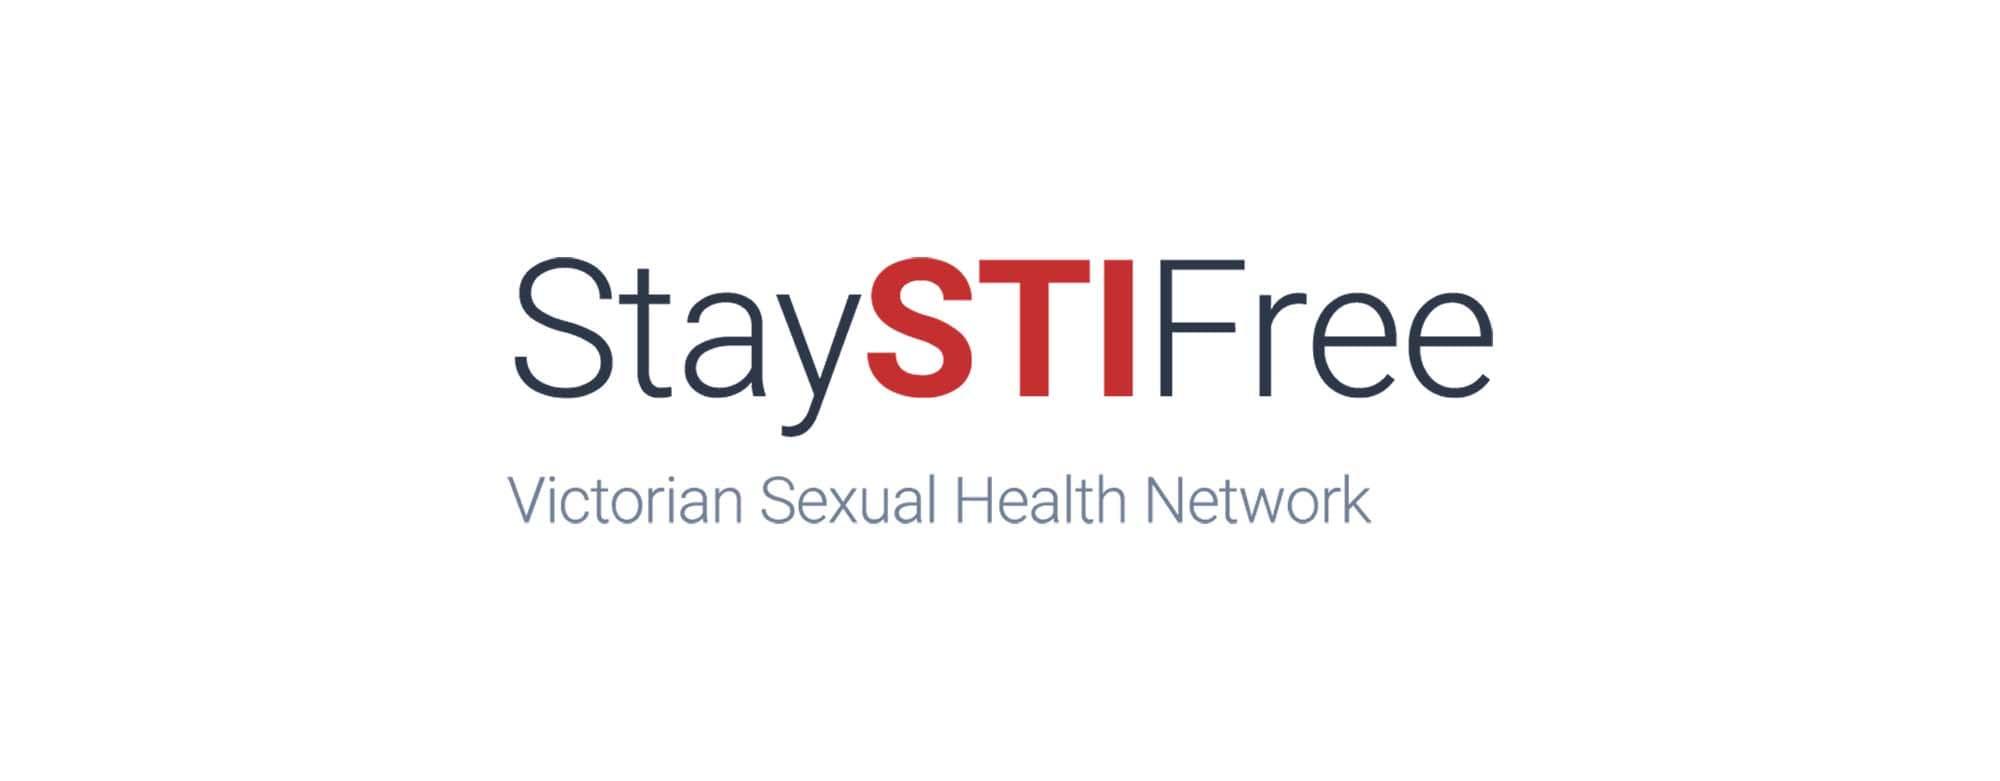 Stay STI free - Victorian Sexual Health Network - logo